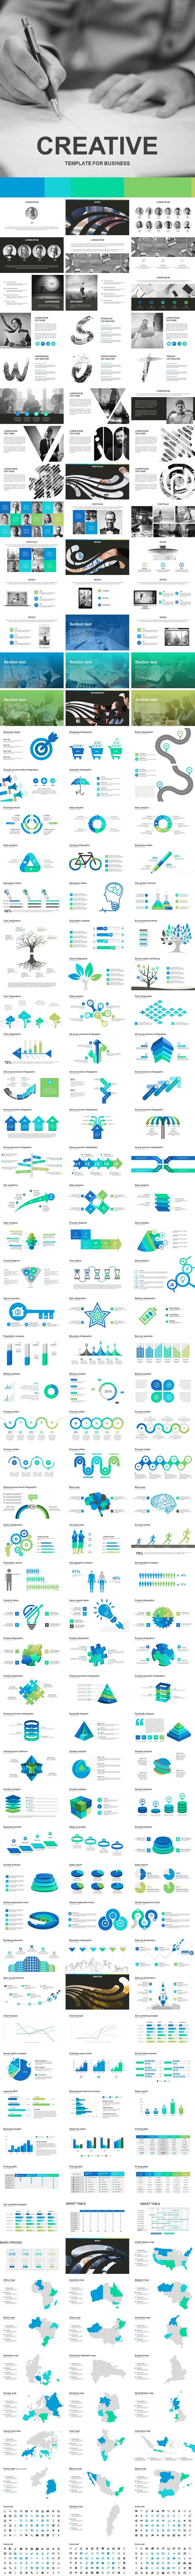 Creative Keynote Template - Business Keynote Templates